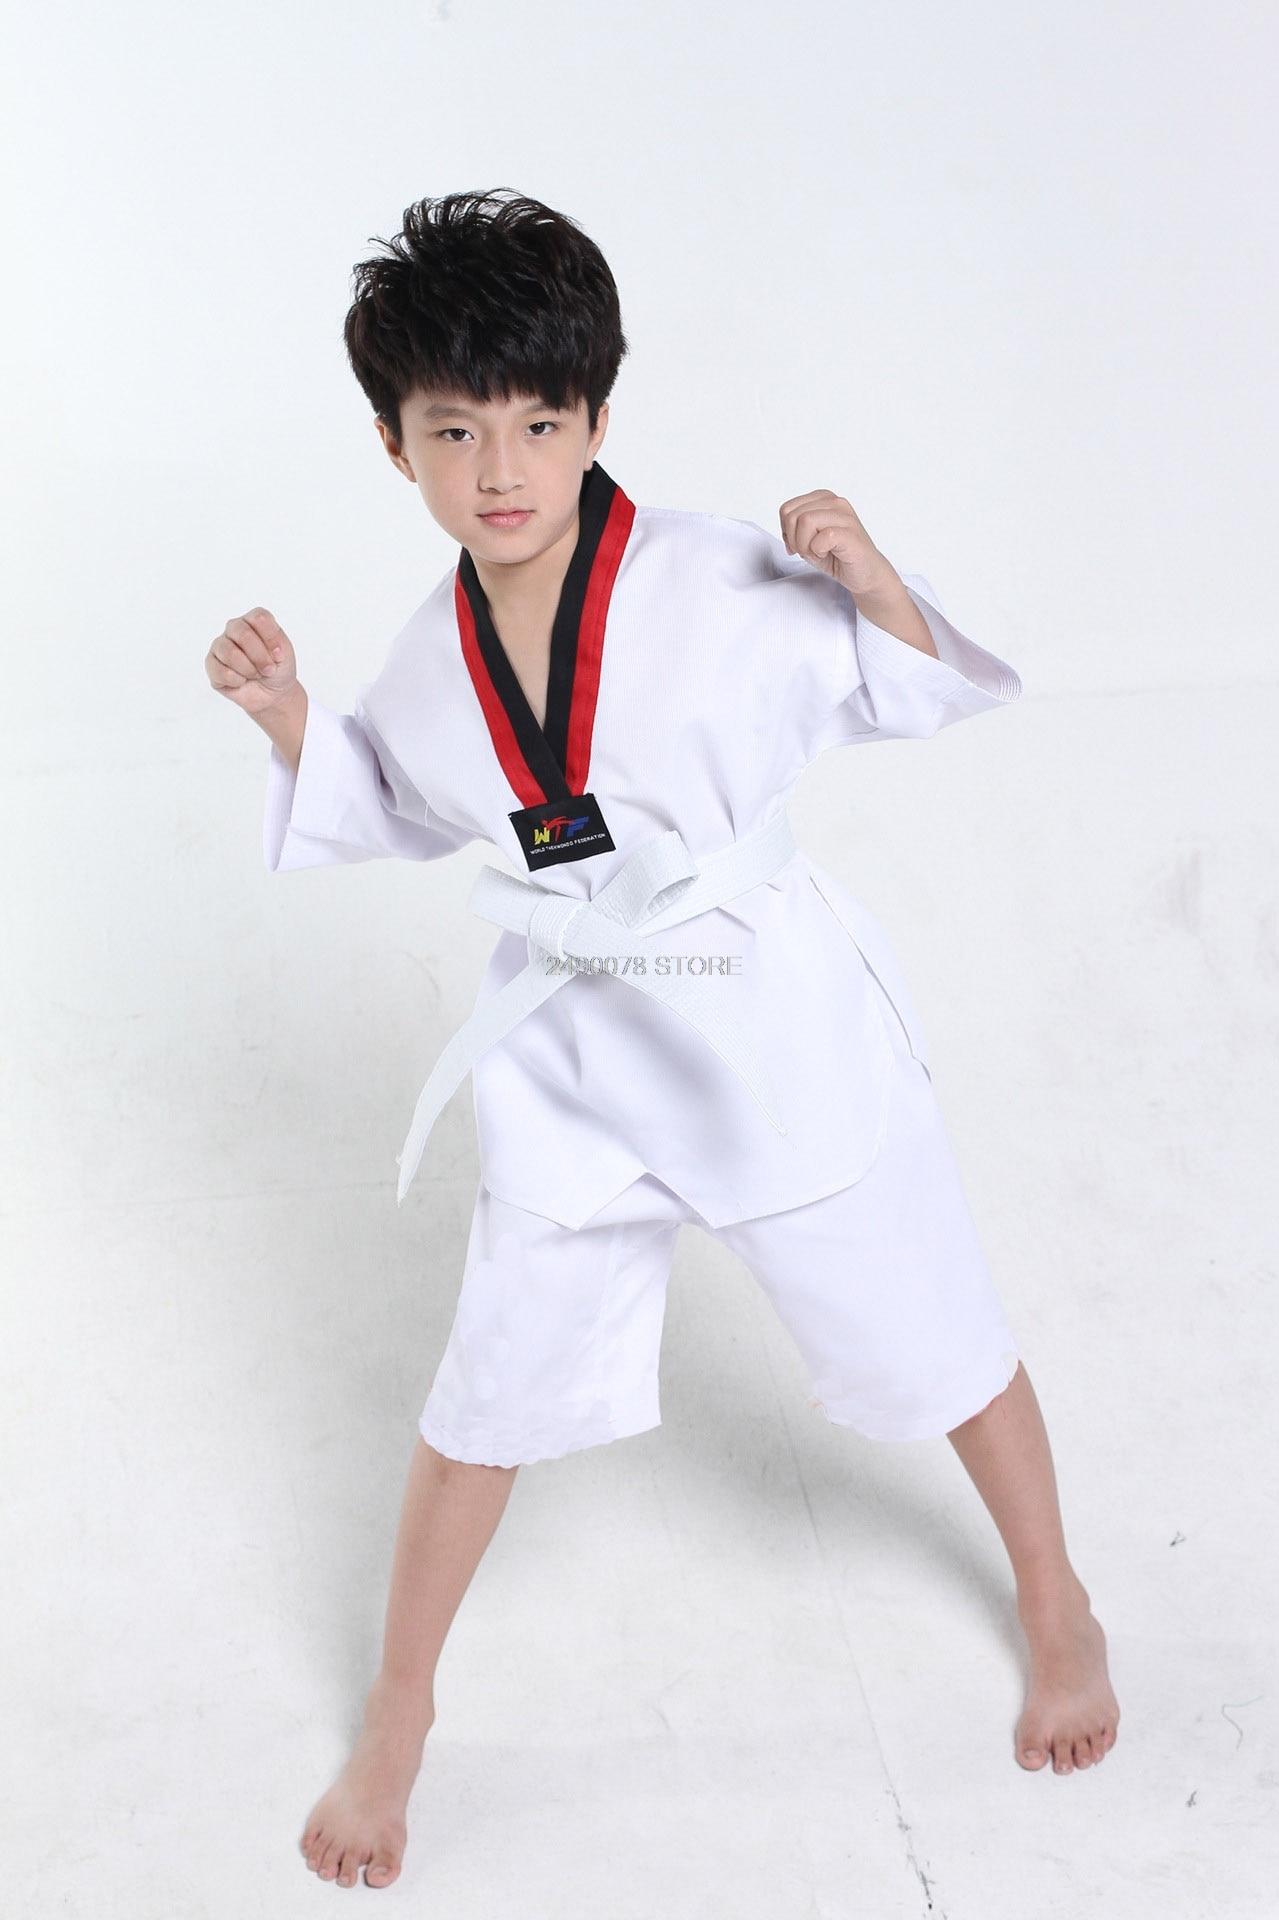 Children Kimono Judo Kickboxing Practice Costume White Kids Boys Girls Taekwondo Suit Karate Tae Kwon Do Clothes F106 3